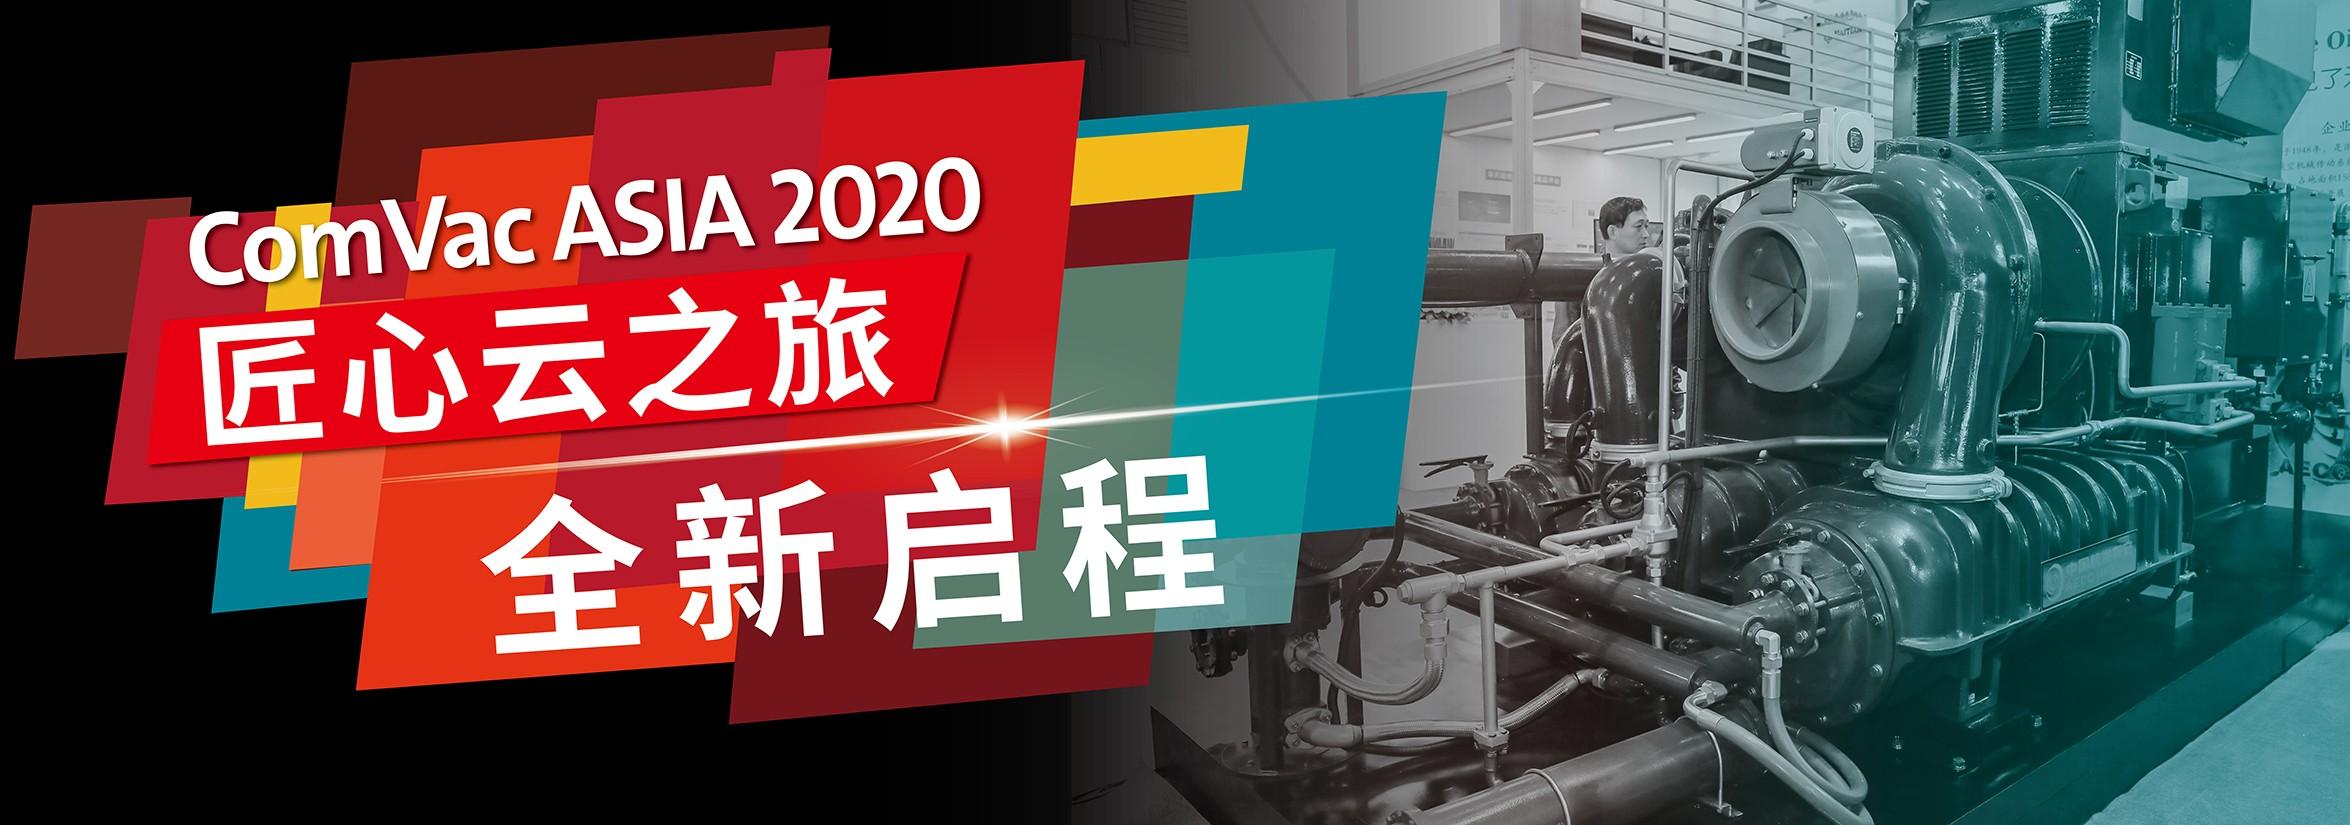 20comvac -匠心之旅-banner-2350-825-cn_画板 1 .jpg